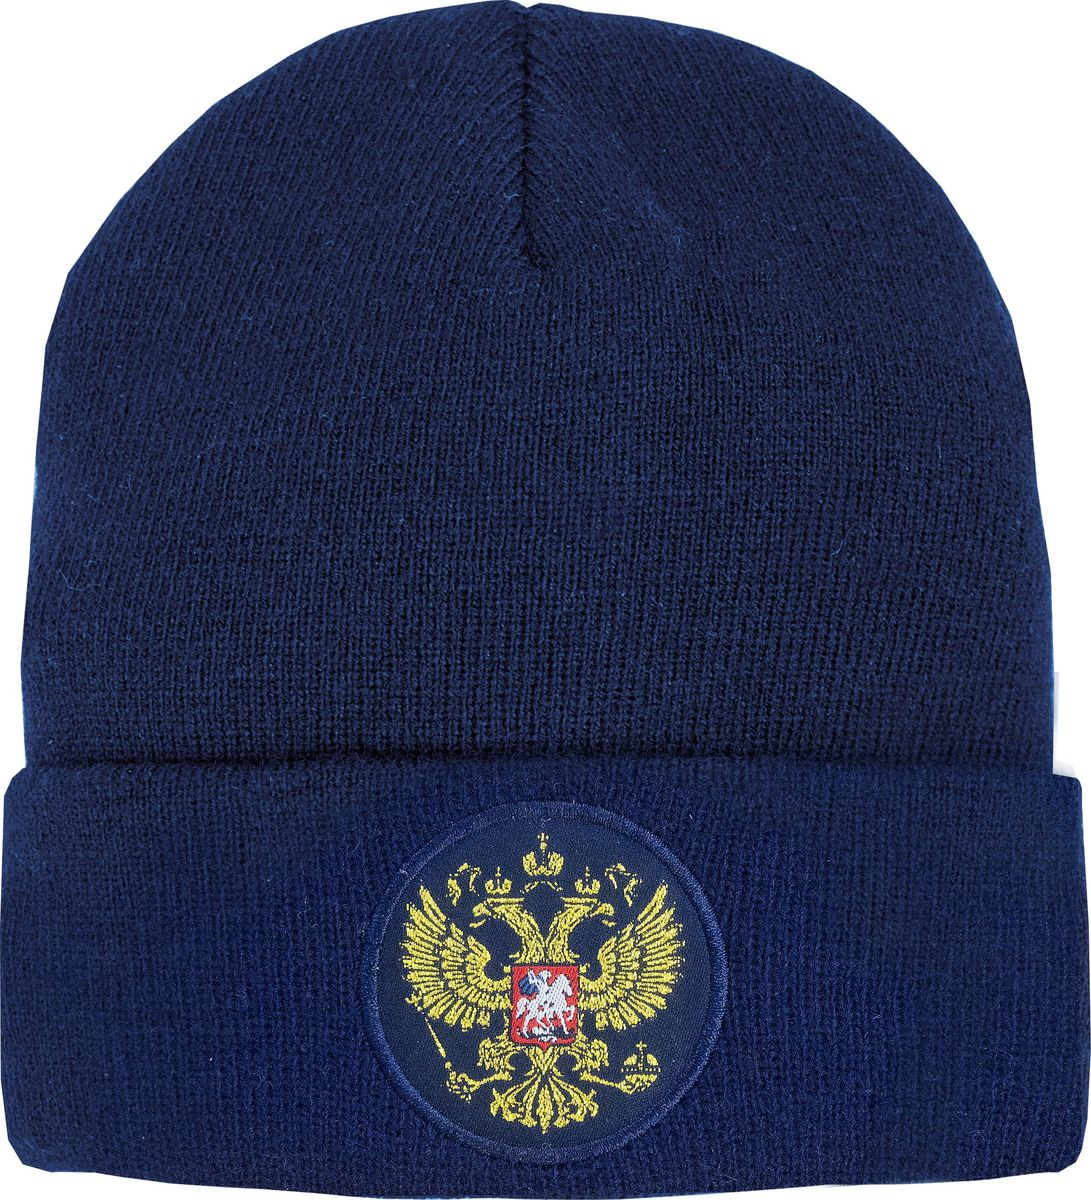 Шапка мужская Atributika & Club Россия, цвет: темно-синий. 11331. Размер 55/58